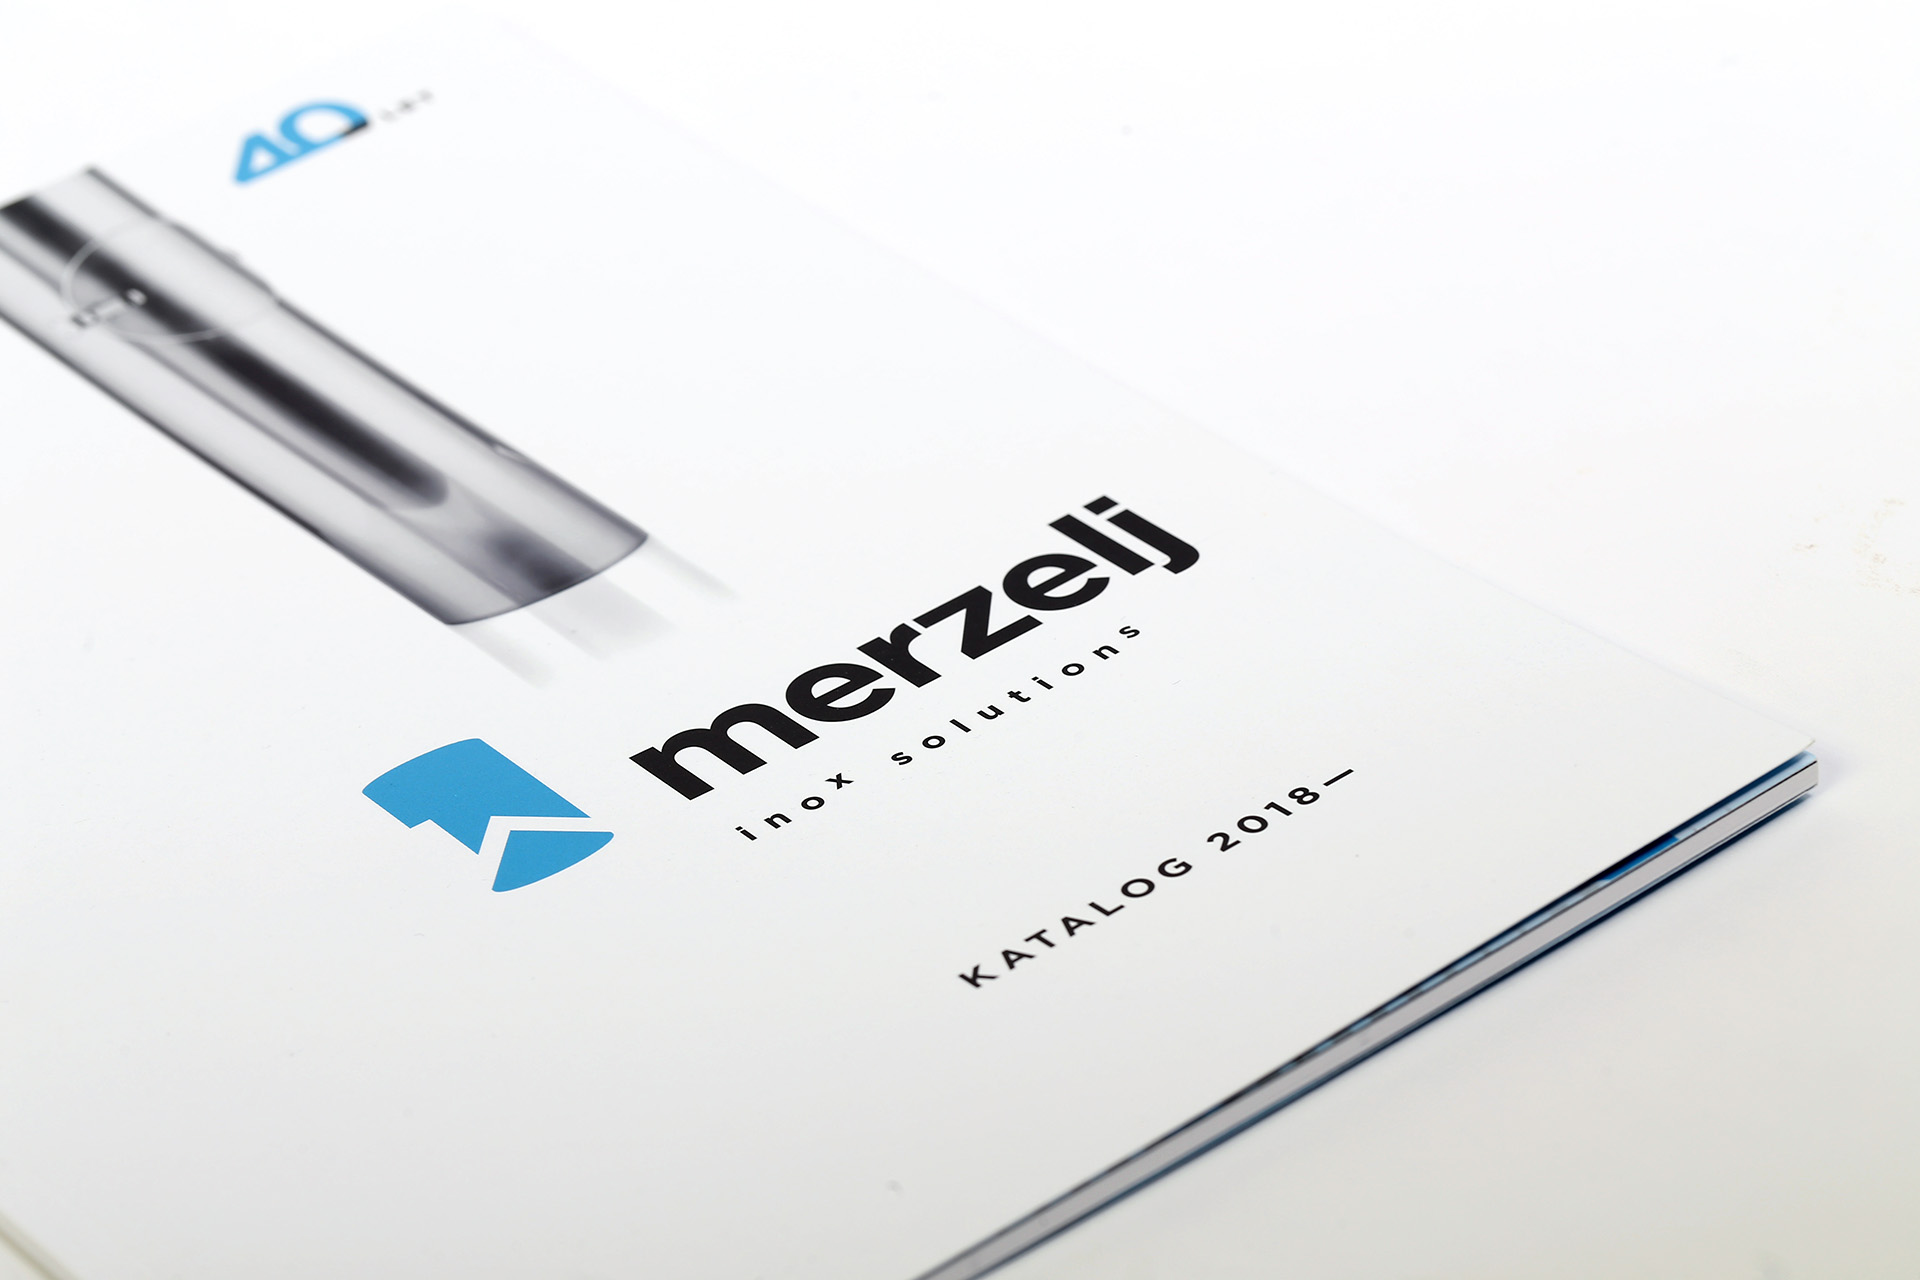 merzelj_vizualna_marko_marinsek_ma-ma_studio_katalog7